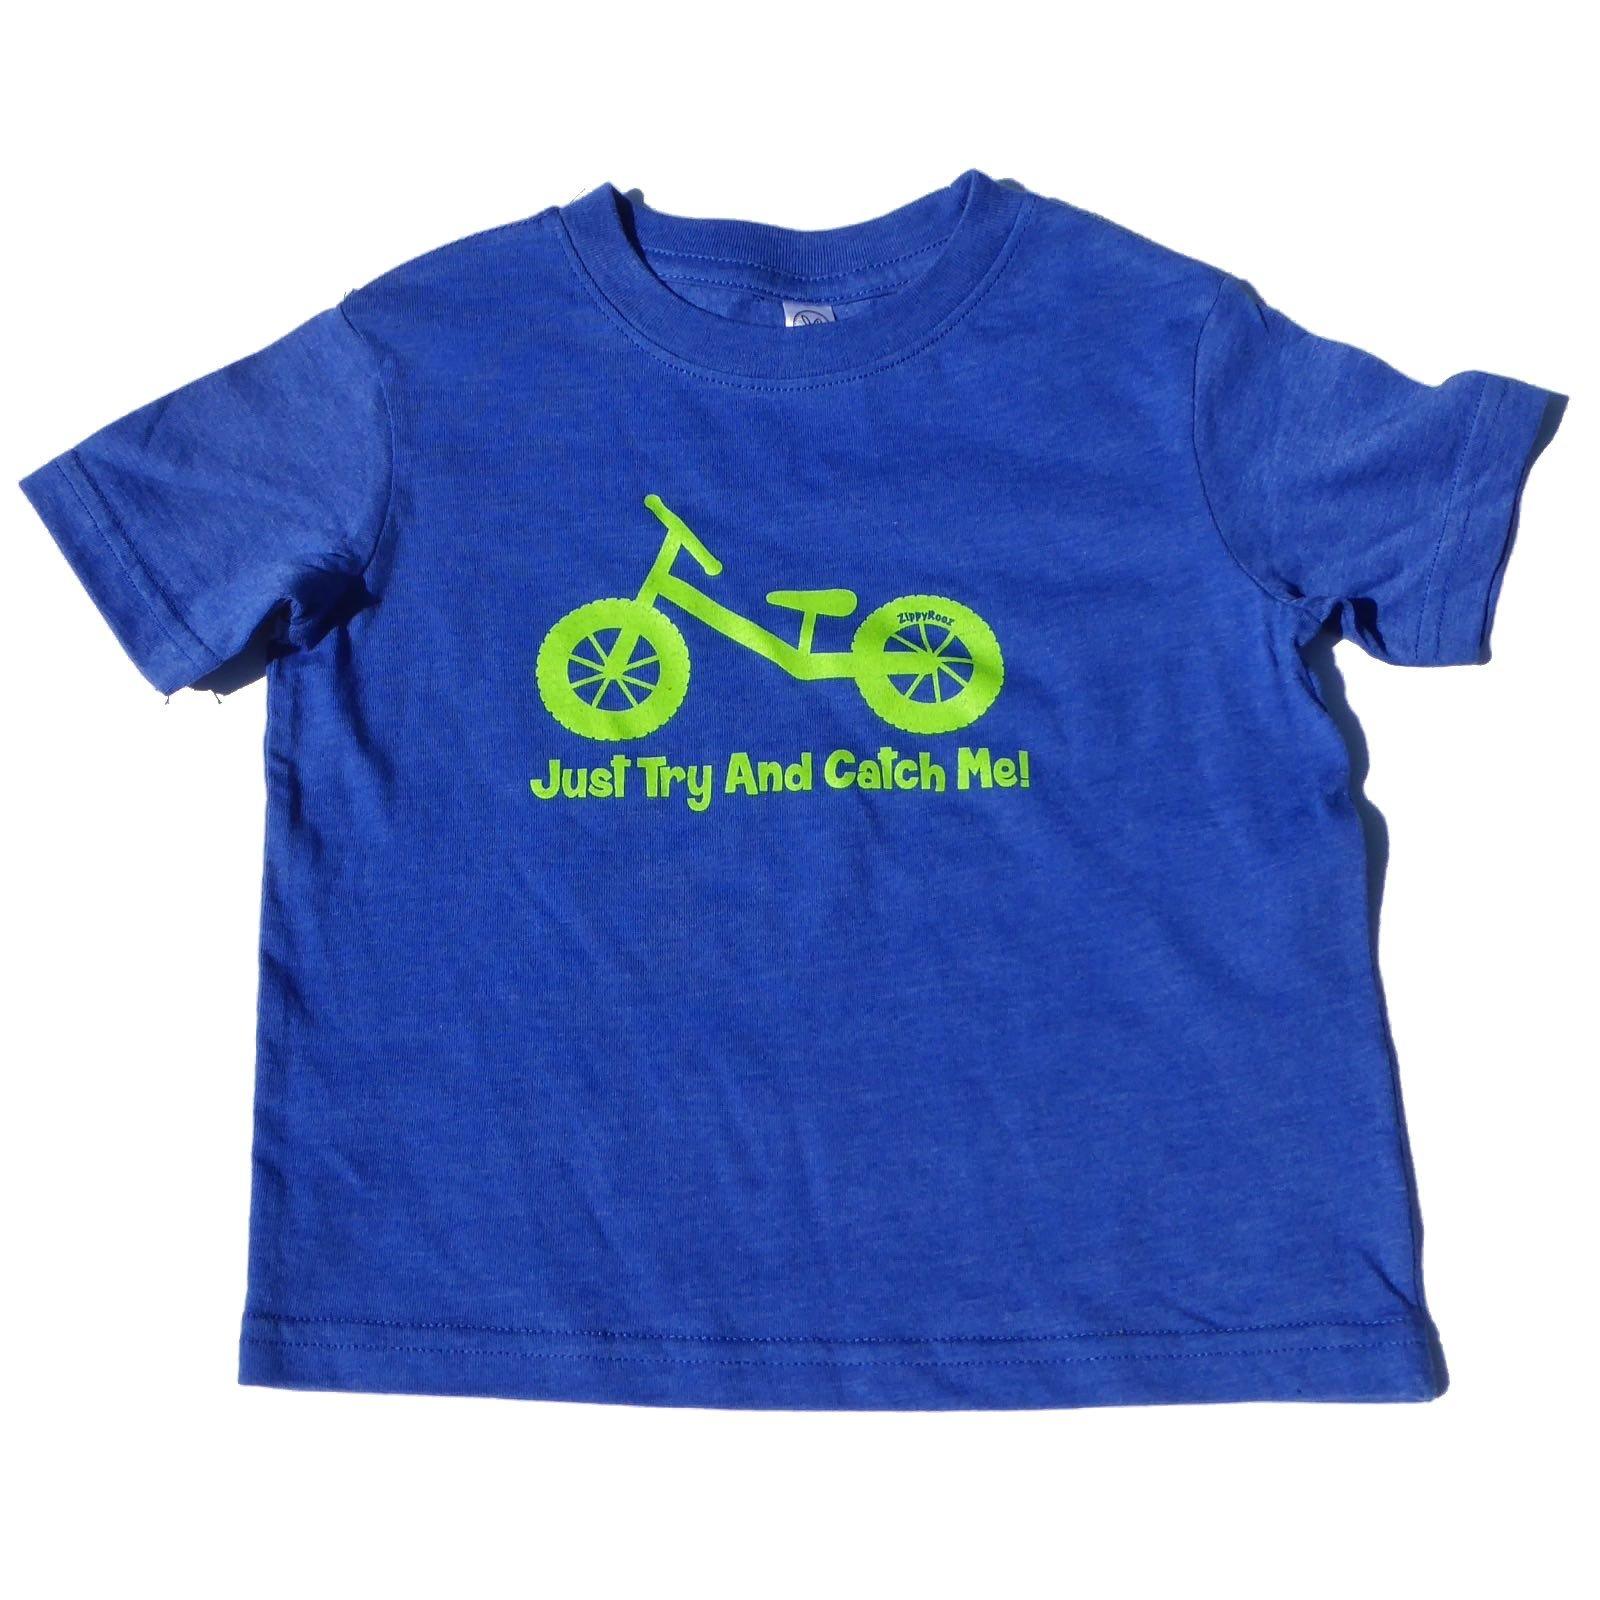 ZippyRooz Boys Toddler & Little Kids Balance Bike Tee Shirt Just Try and Catch Me! (2T)